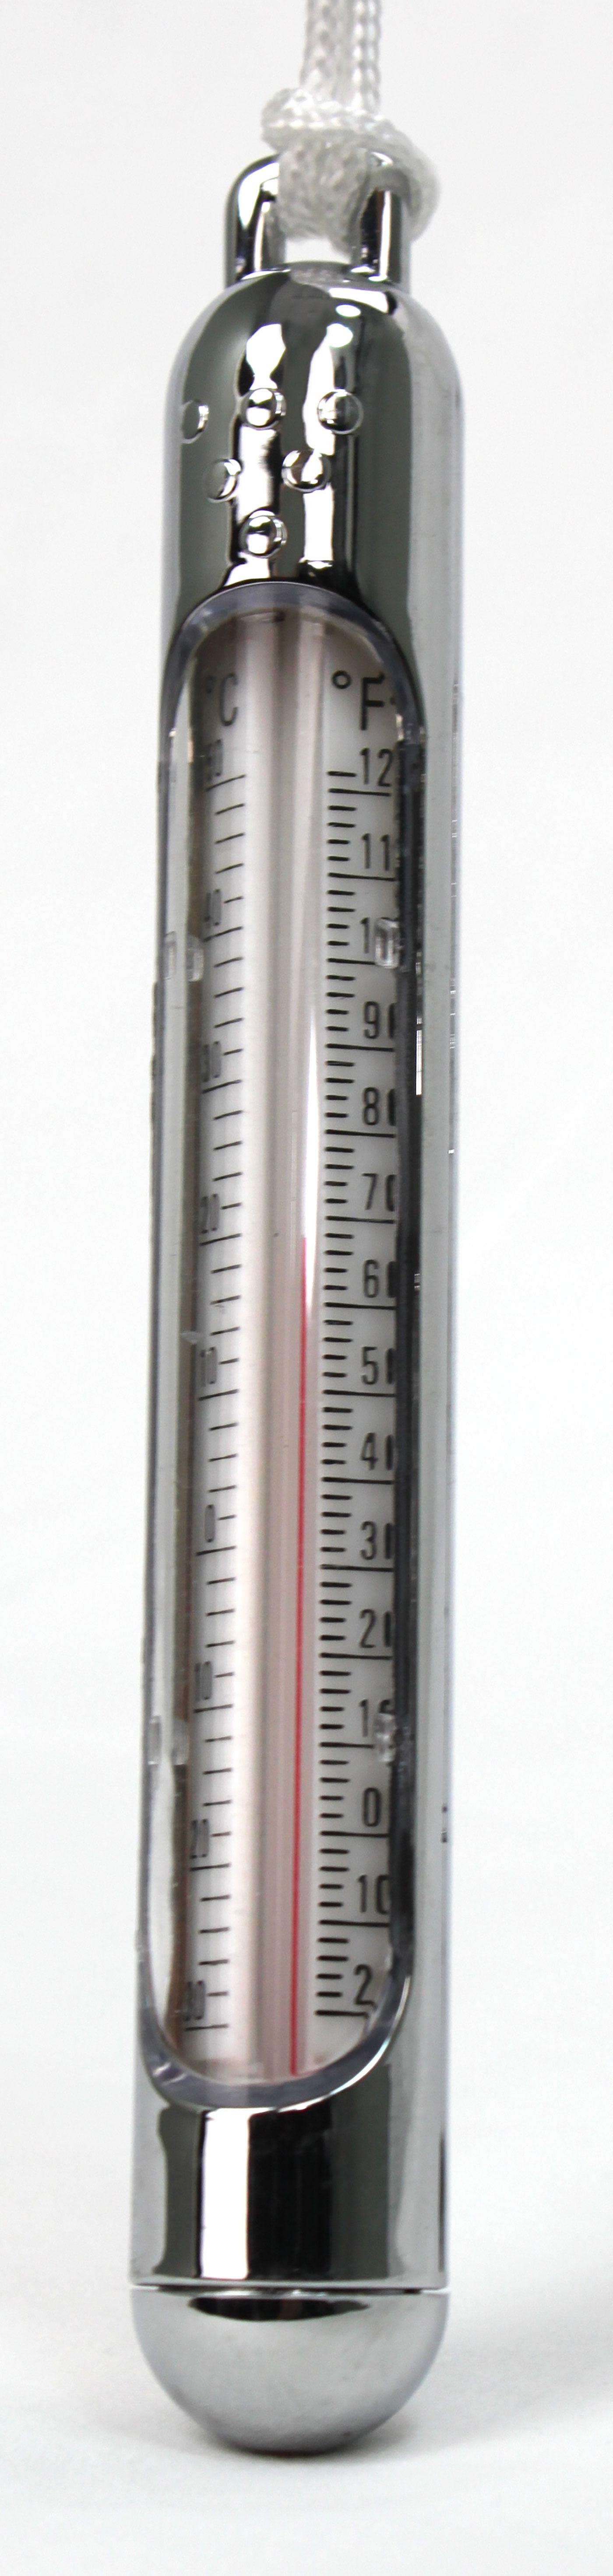 Chrome Tube Thermometer Poolsupplies Com